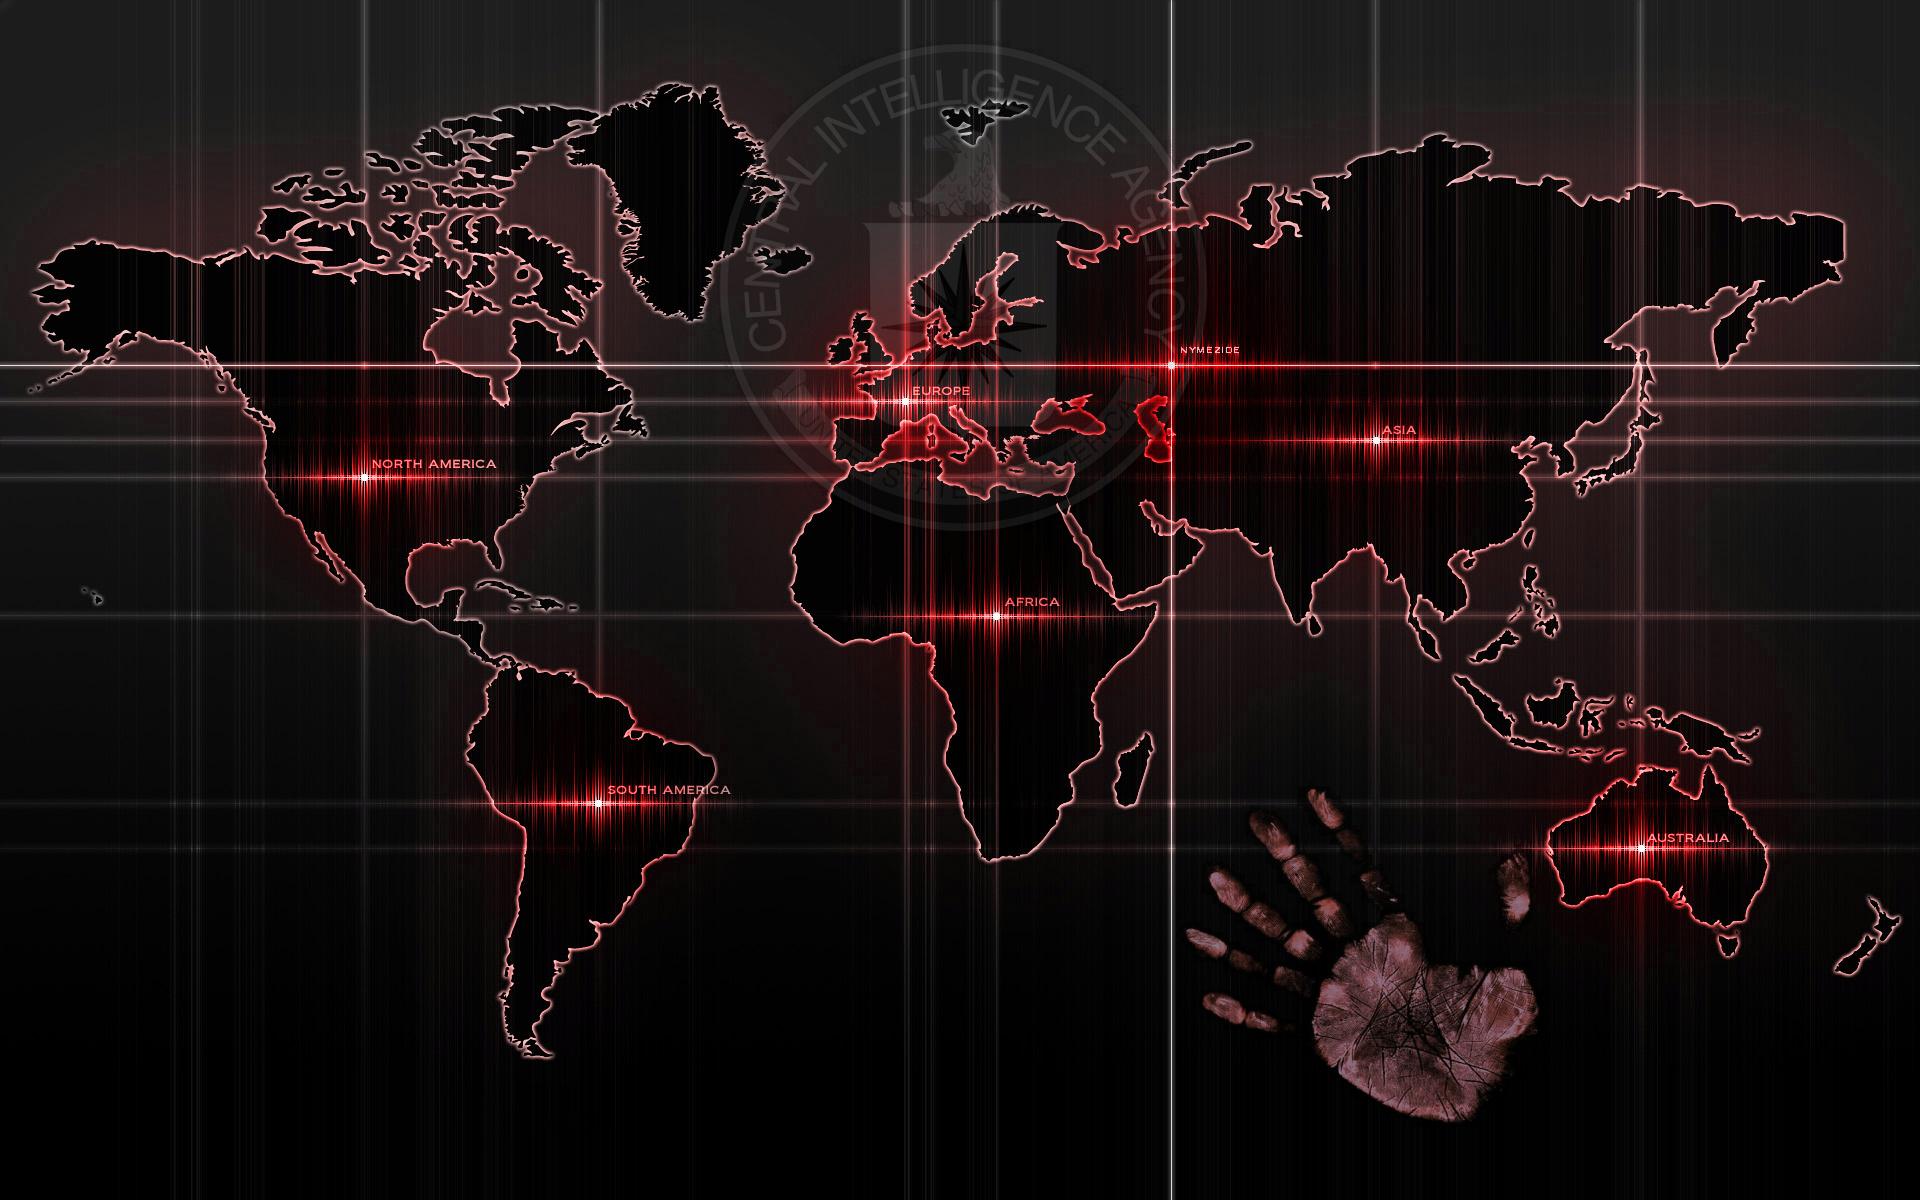 illustration technology world map handprints streaks shape line darkness number screenshot computer wallpaper human body font